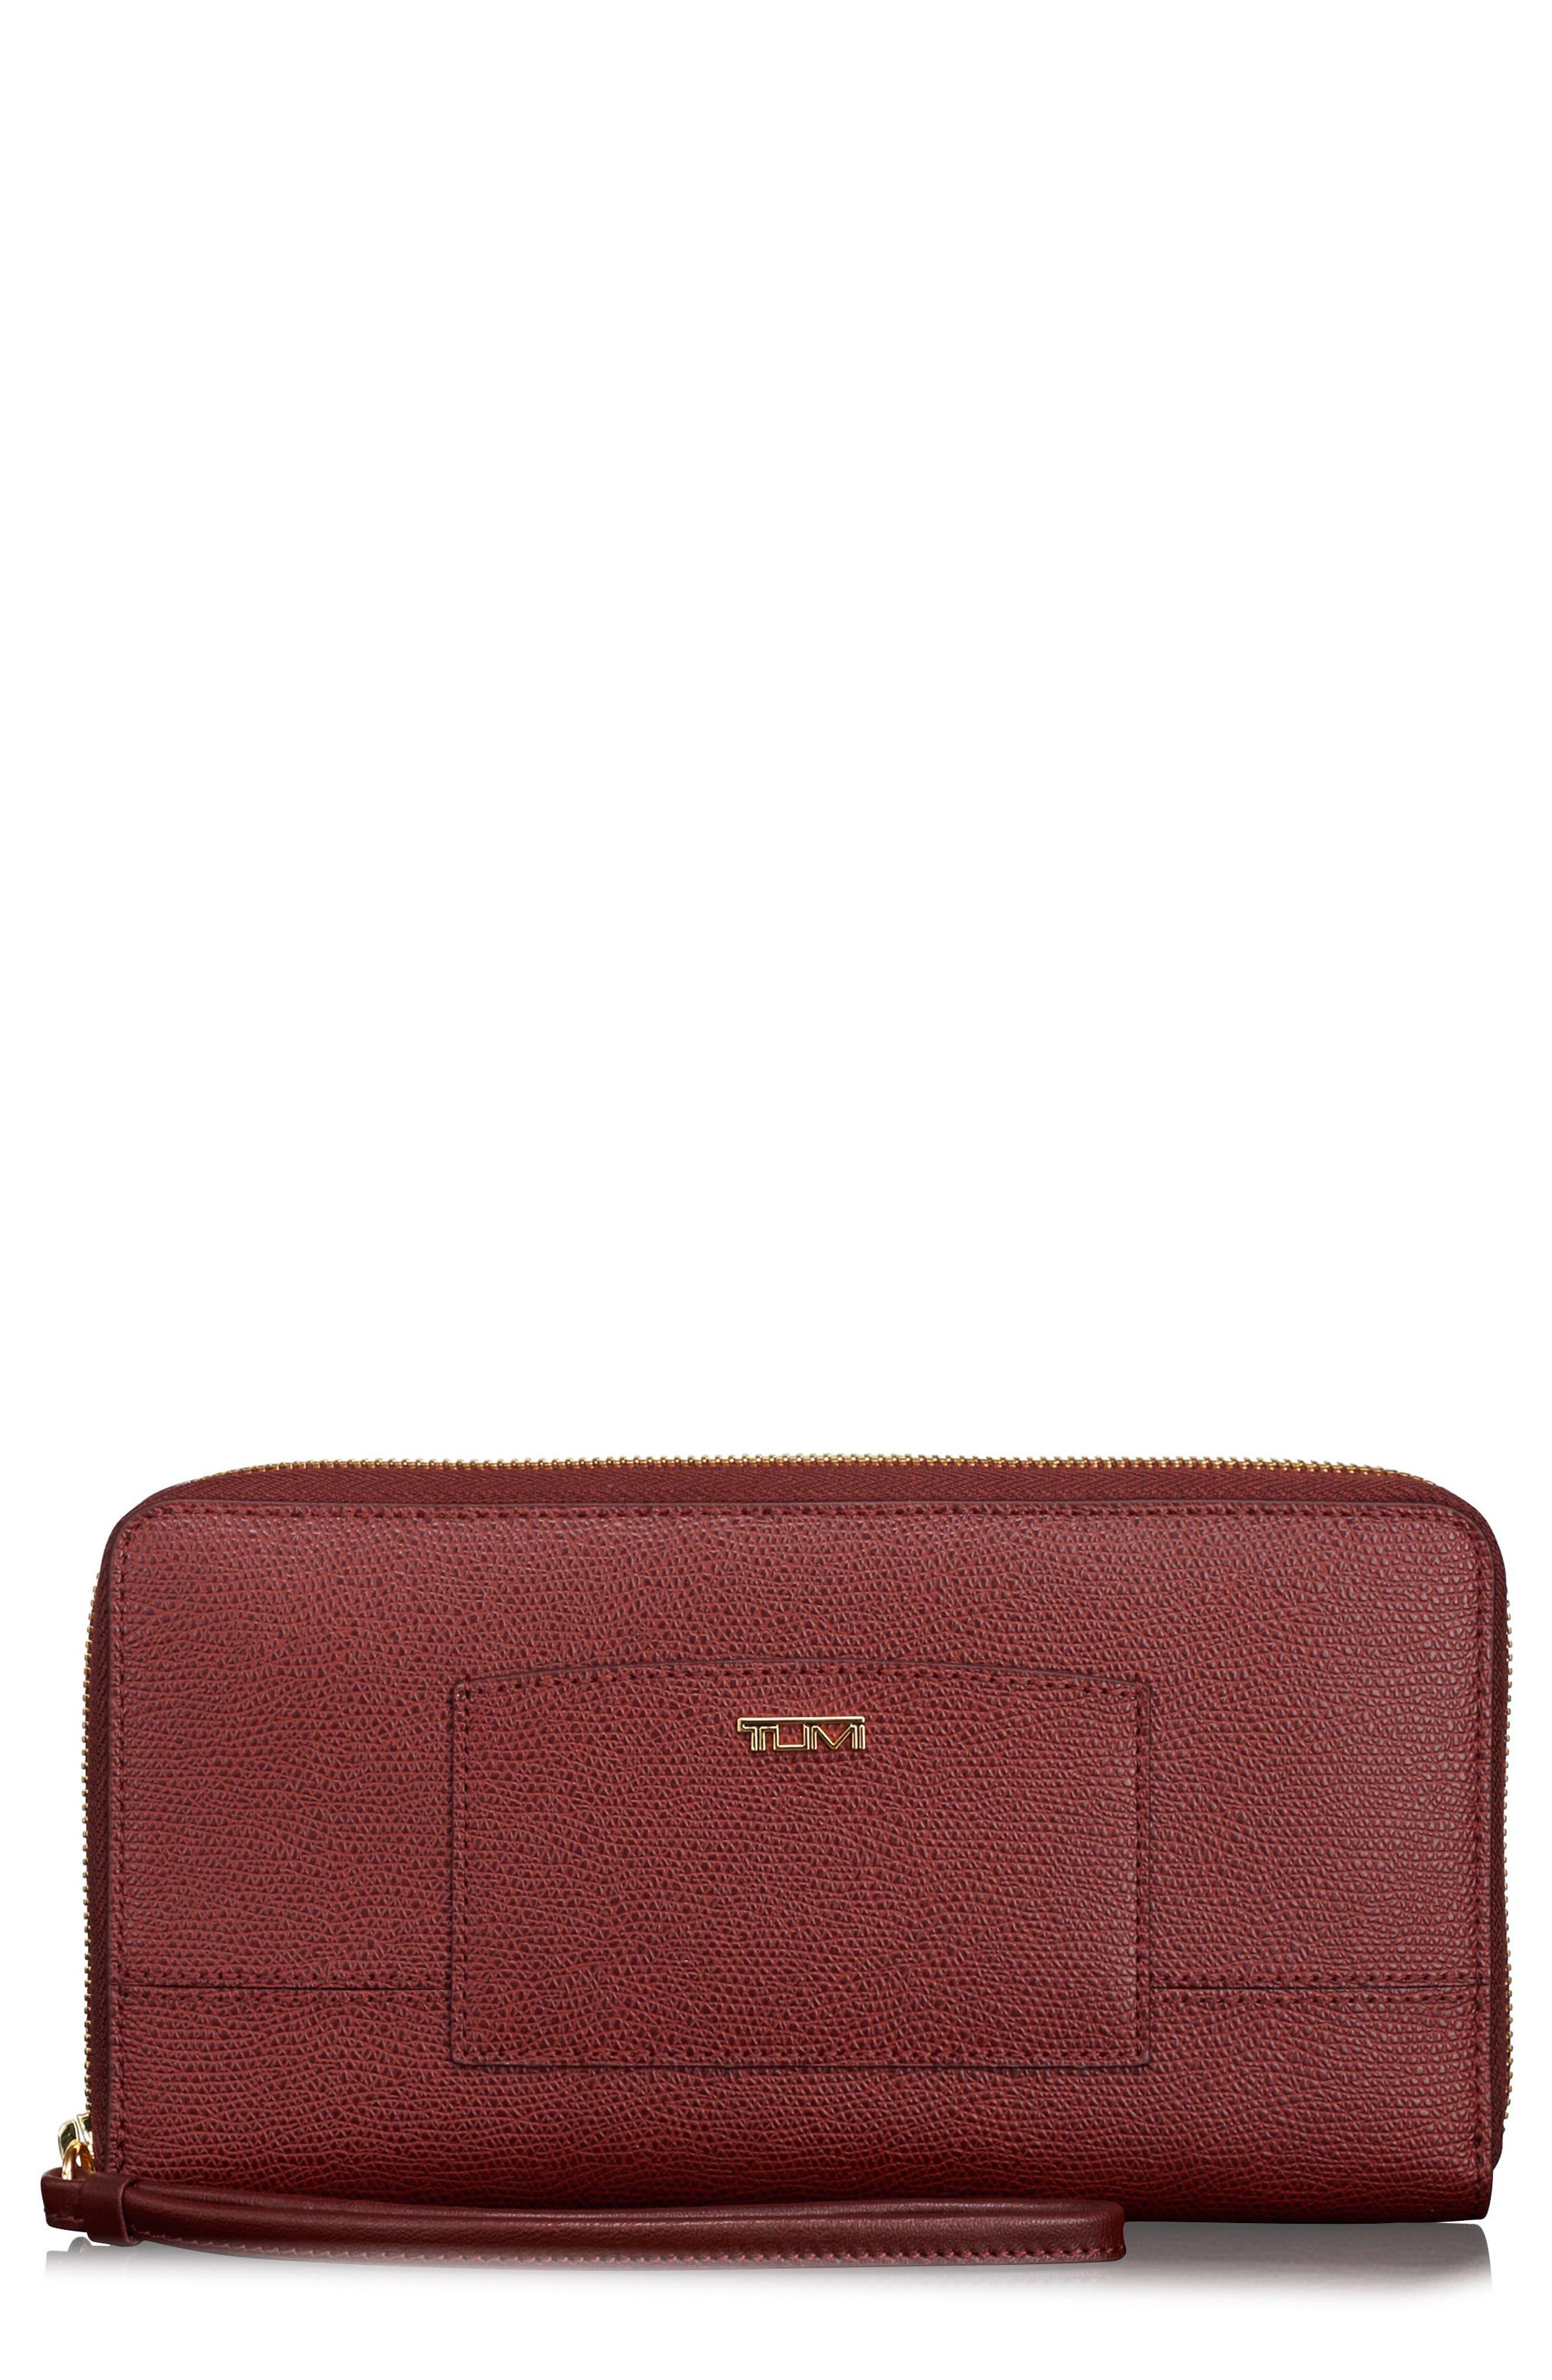 Travel Wallet,                         Main,                         color, Burgundy